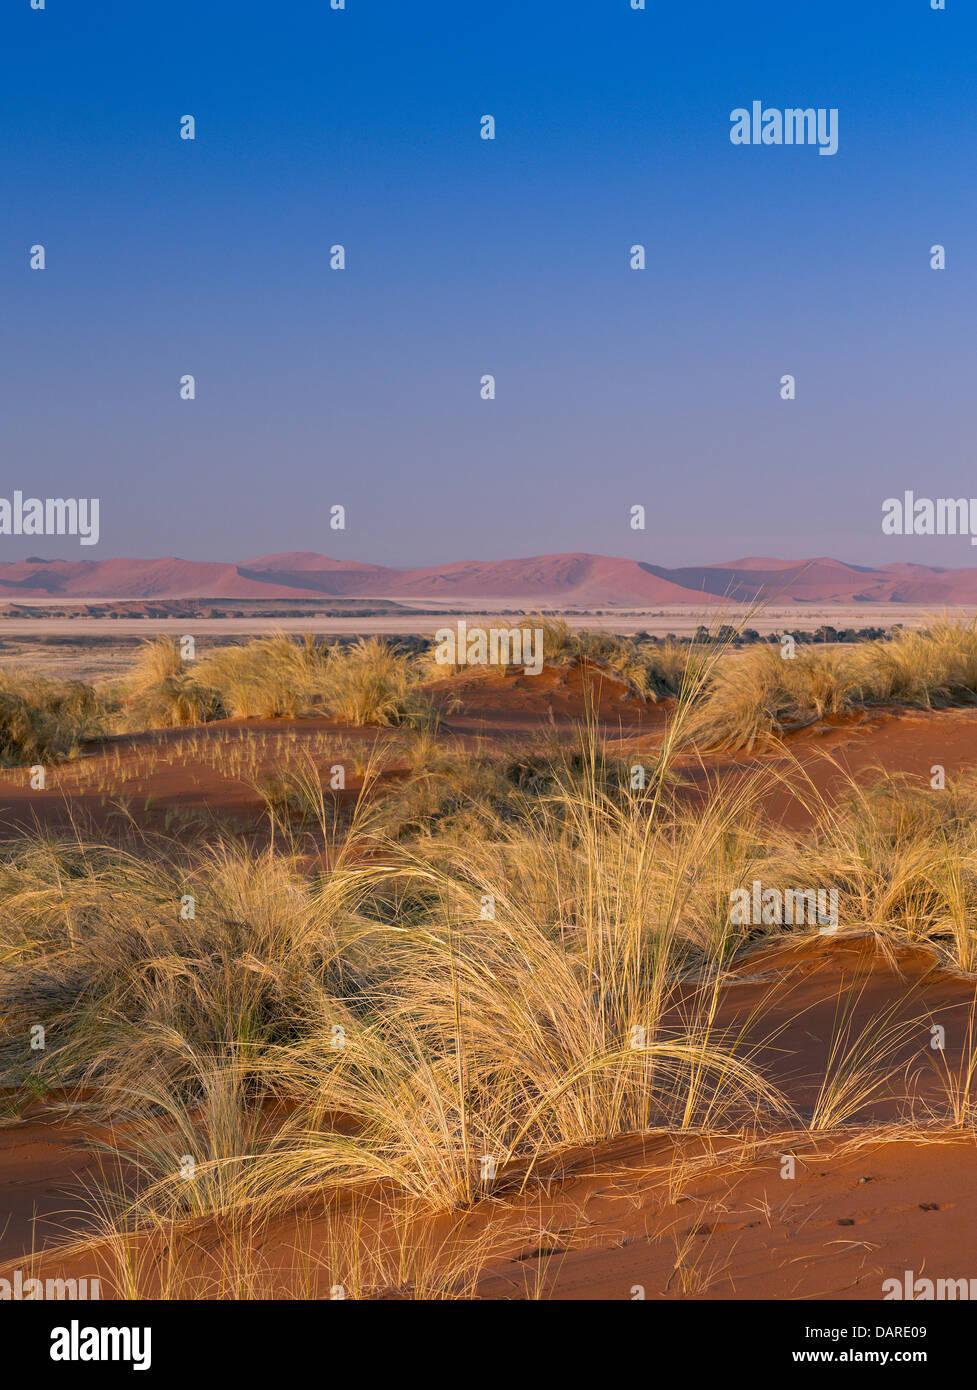 Desert grasses, Sossuspoort lookout in the Namib Naukluft Desert Park, Namibia - Stock Image